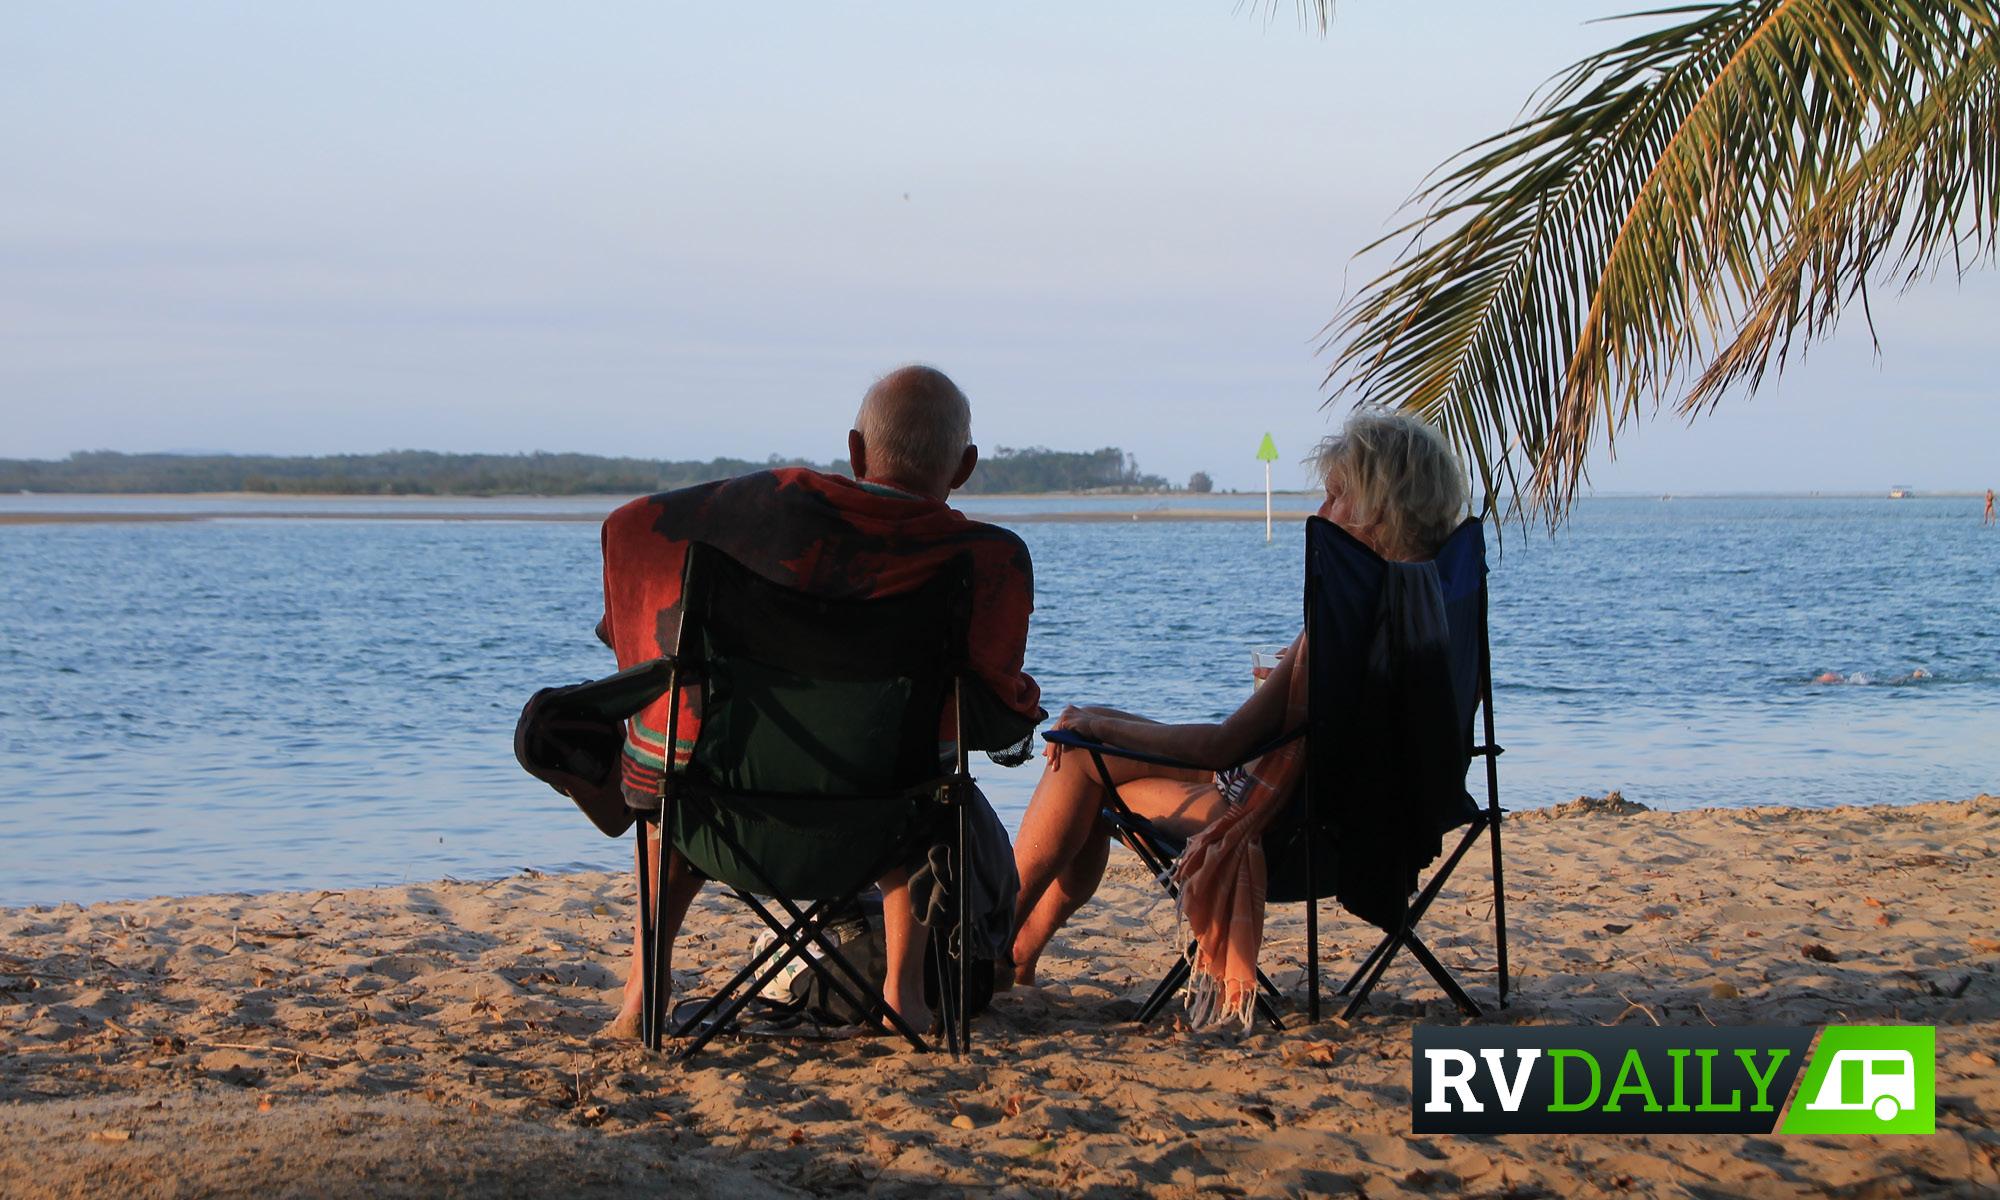 GREY NOMADS: JUST JERKS IN CARAVANS?